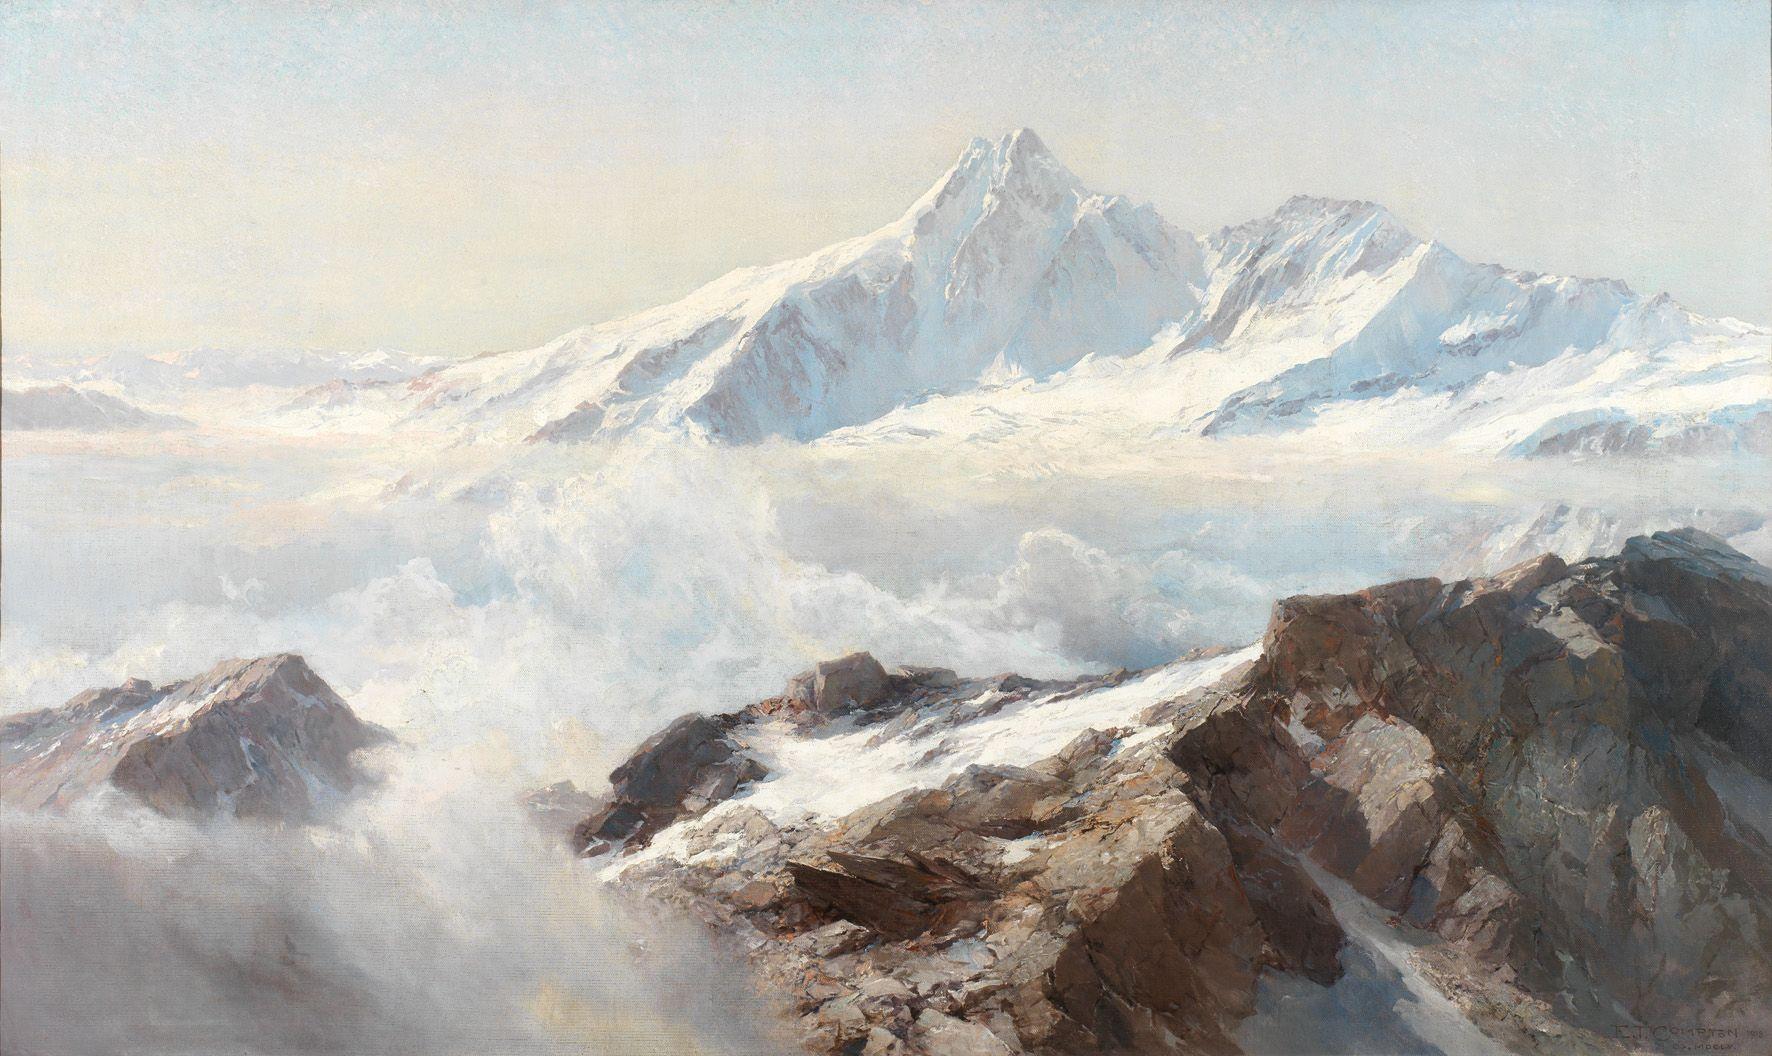 Edward Theodore Compton | Landscape Painting | Pinterest ...